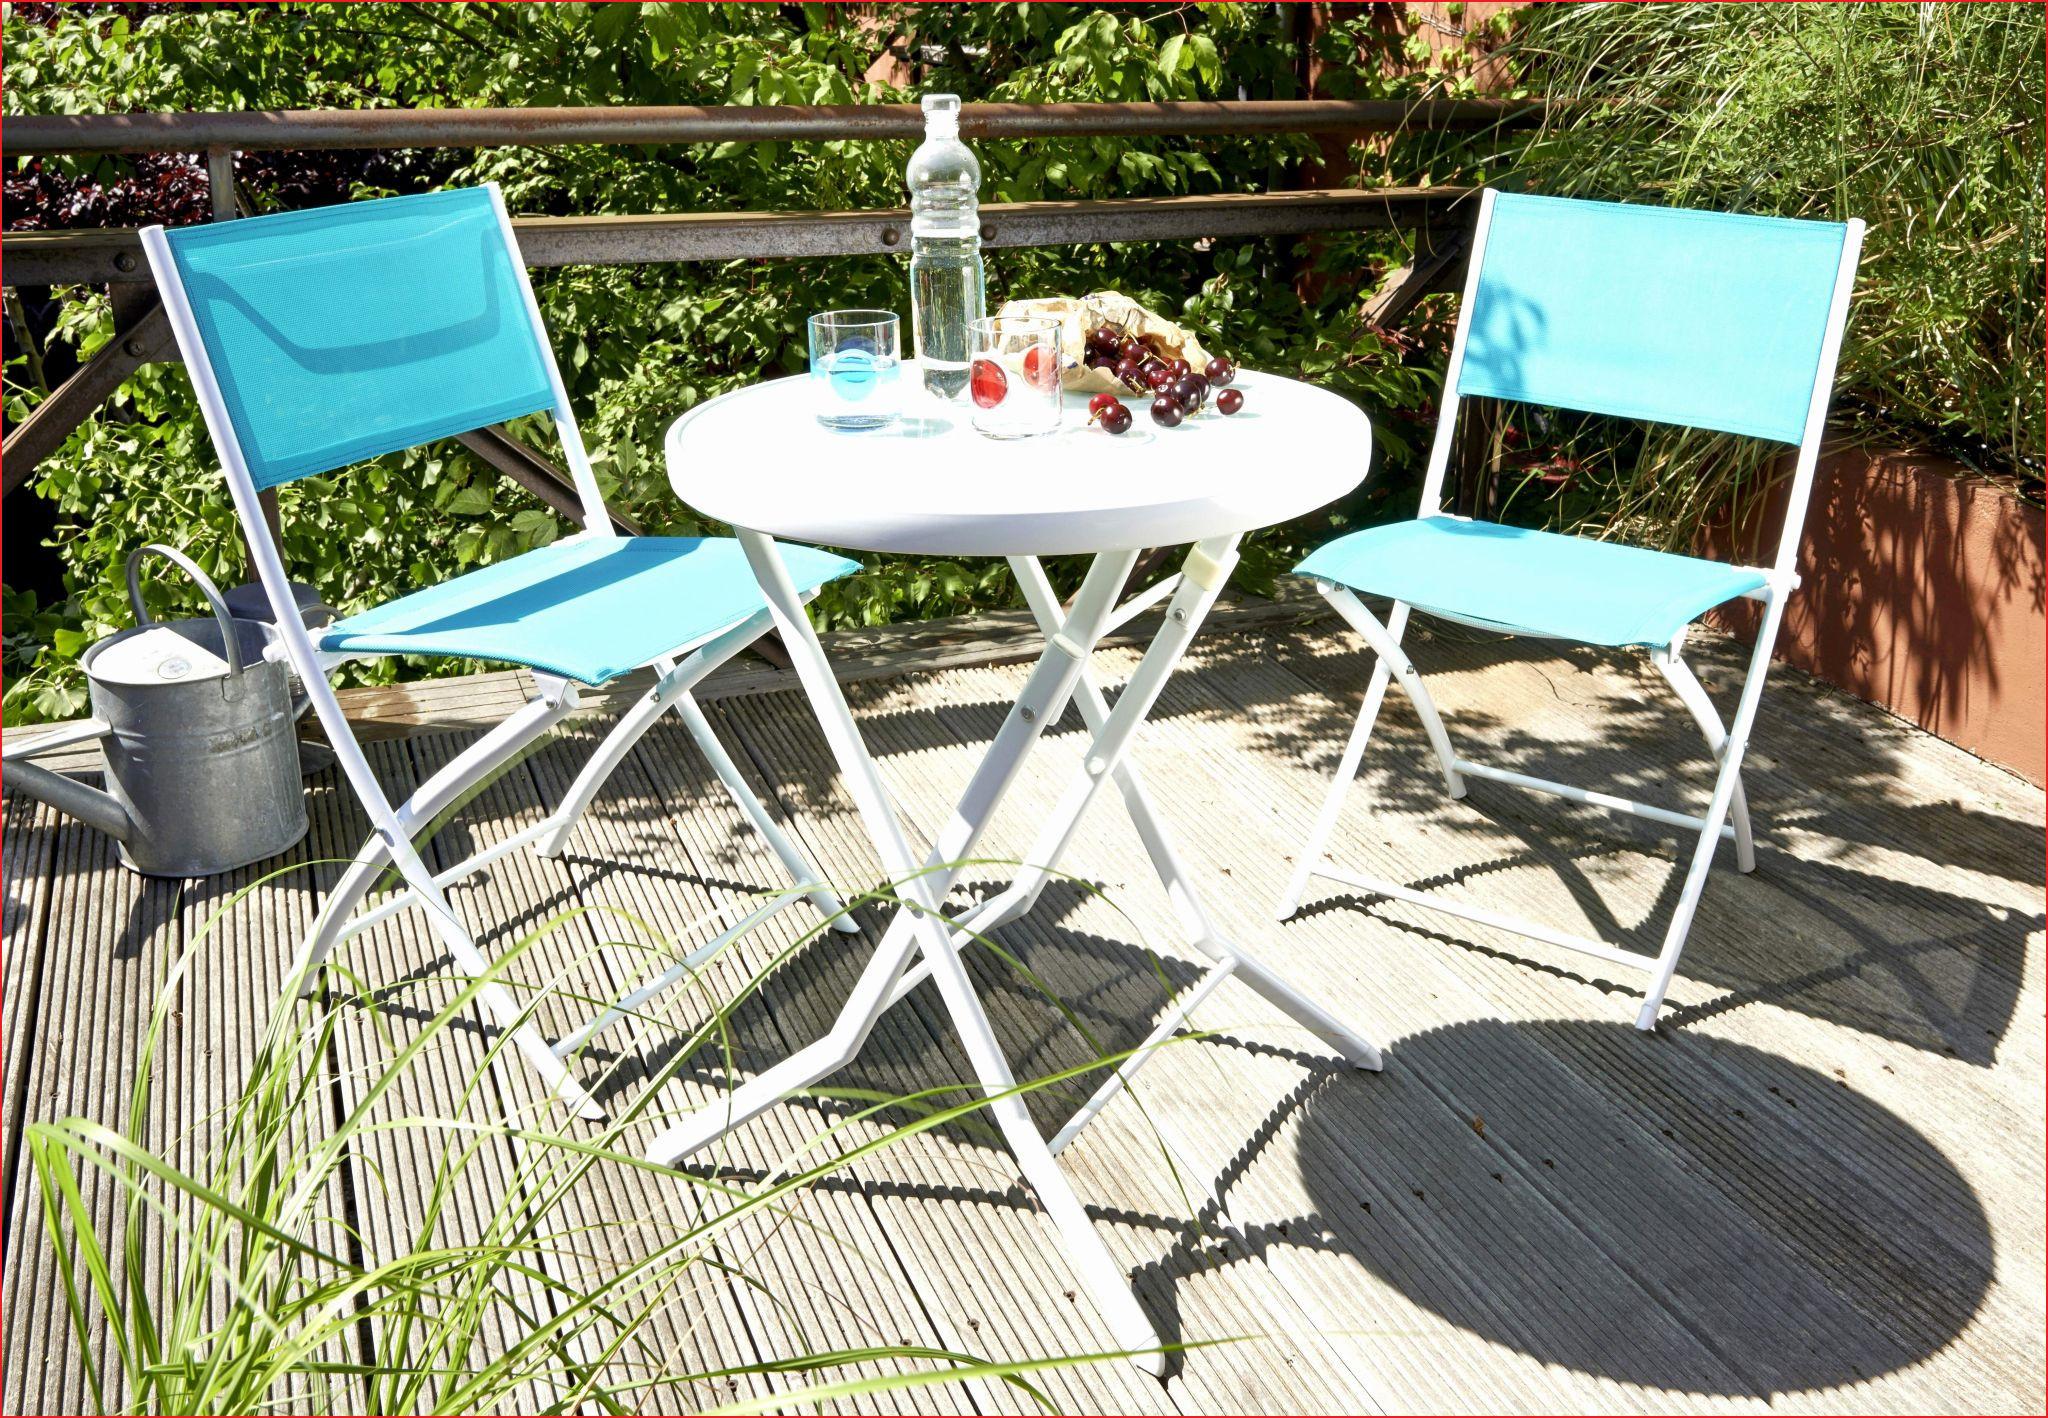 36 Luxe Allibert Mobilier De Jardin | Salon Jardin concernant Table De Jardin En Solde